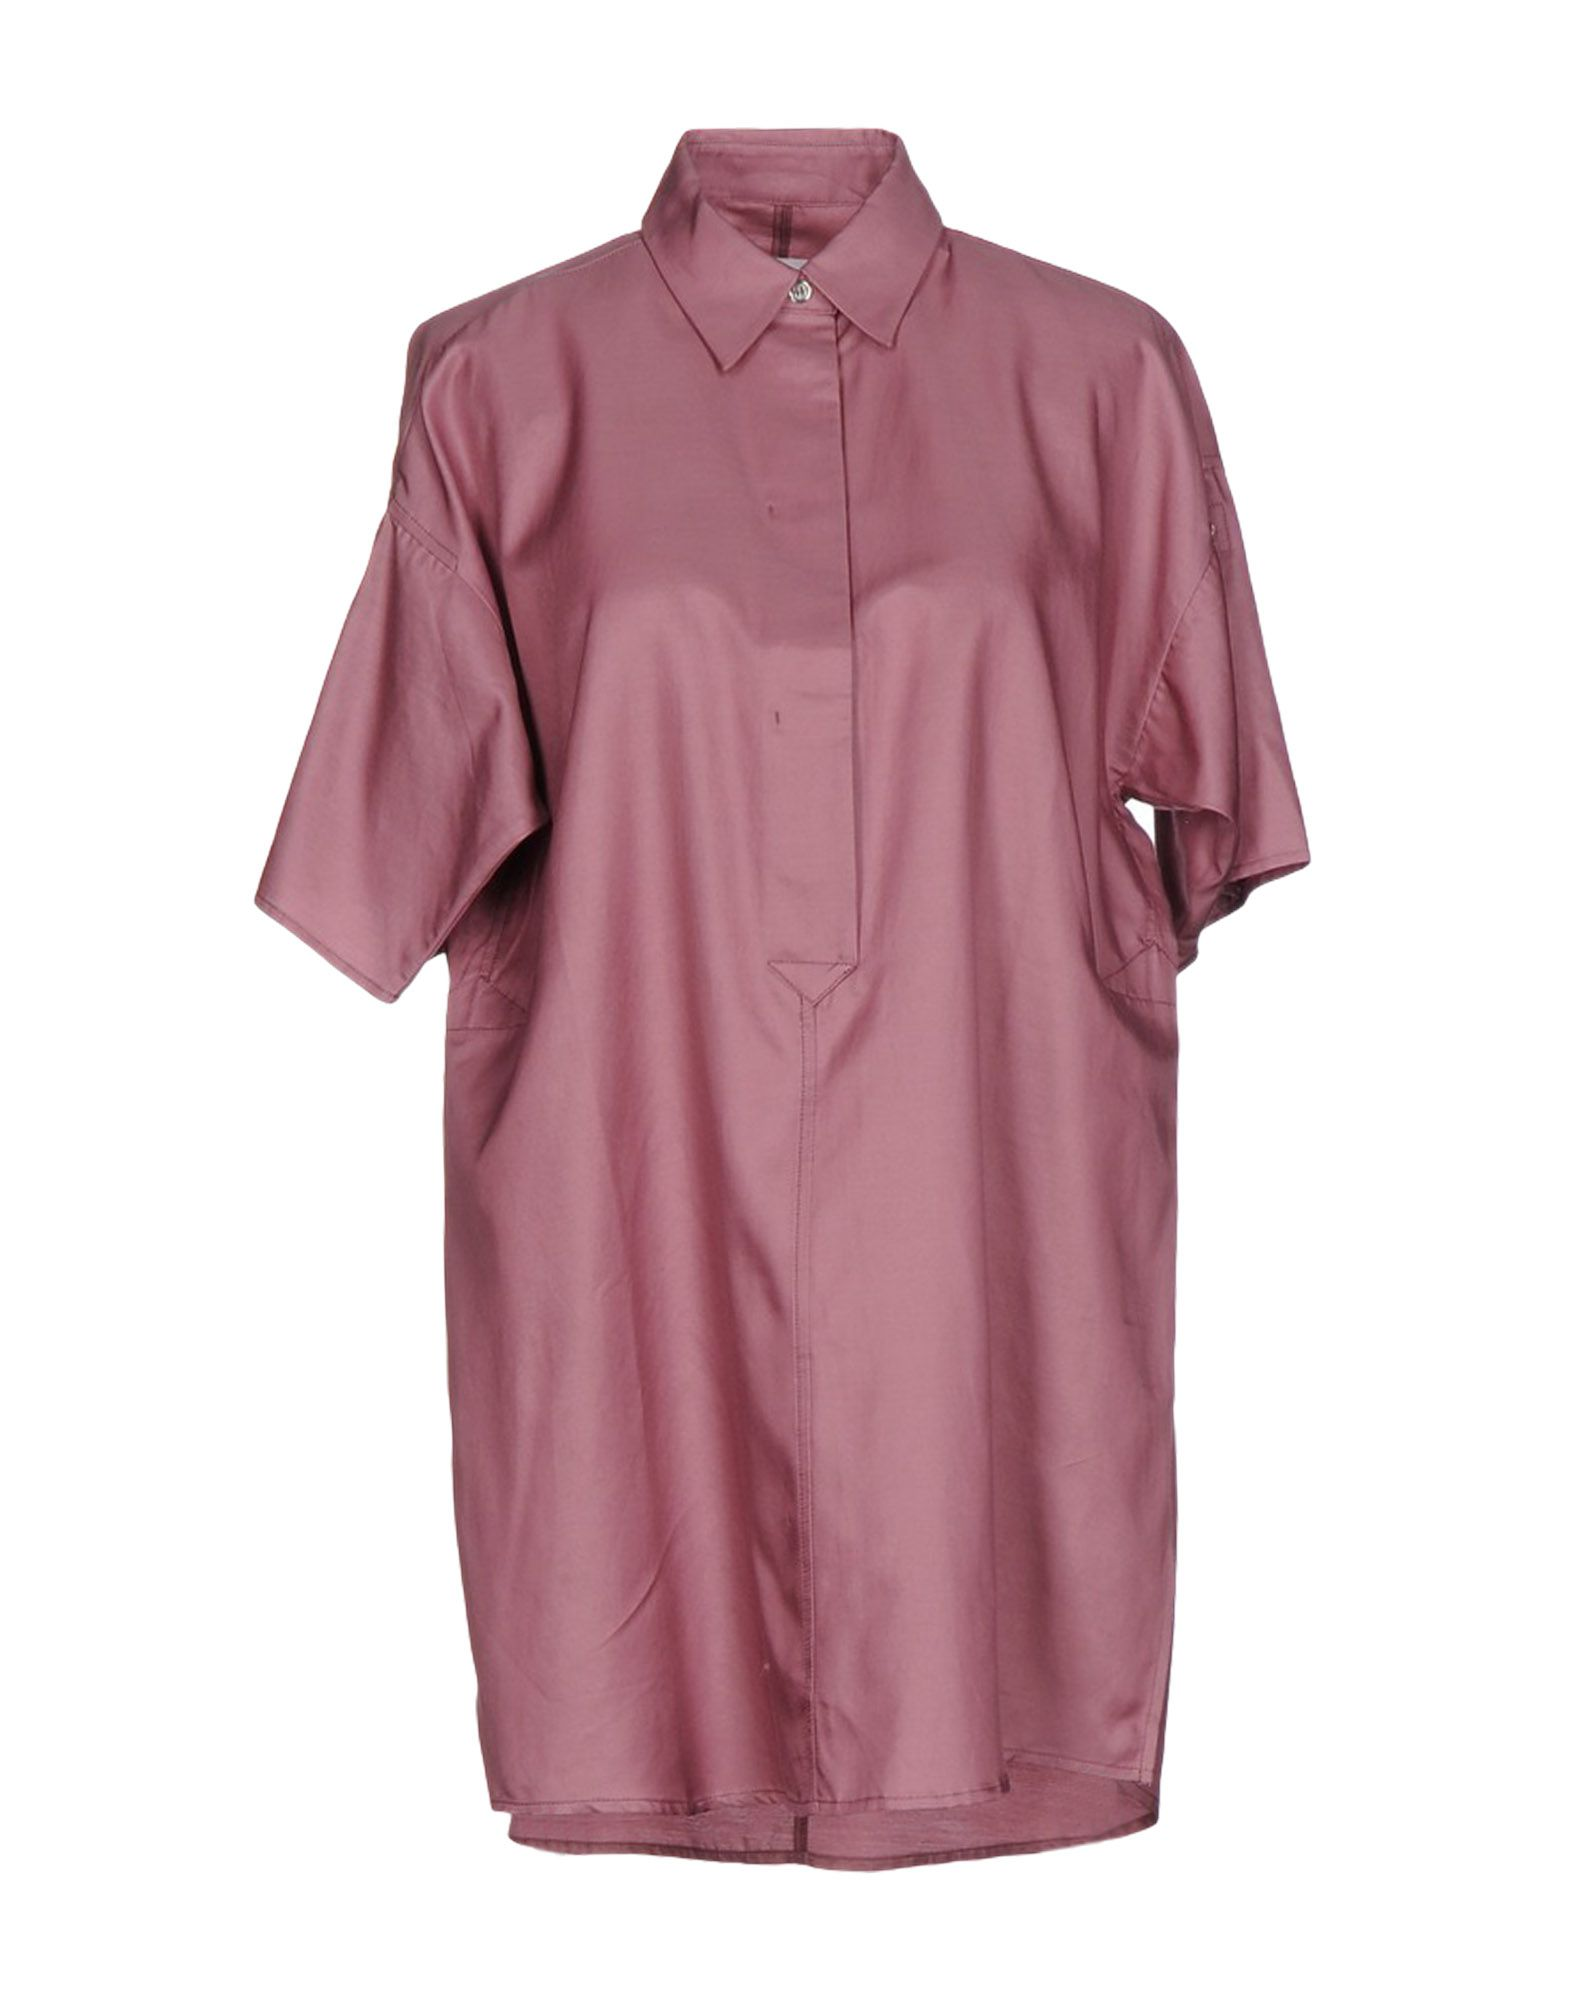 MM6 MAISON MARGIELA Damen Bluse Farbe Altrosa Größe 5 - broschei